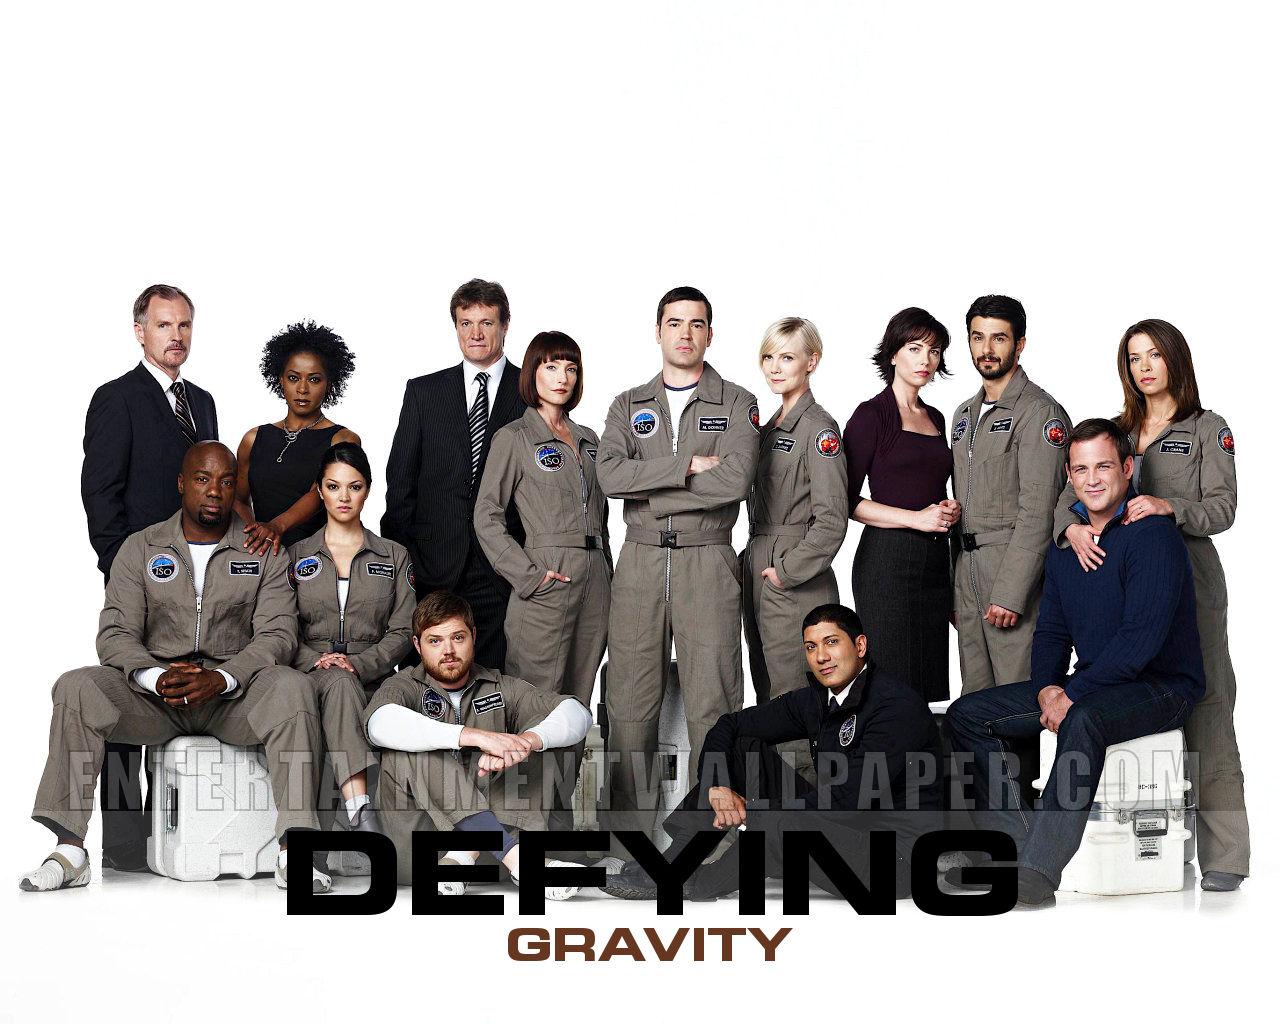 http://2.bp.blogspot.com/-5DWGAZ1Jv48/T66bXHX5-NI/AAAAAAAABiA/KdMeEpf2XvY/s1600/tv_defying_gravity01.jpg